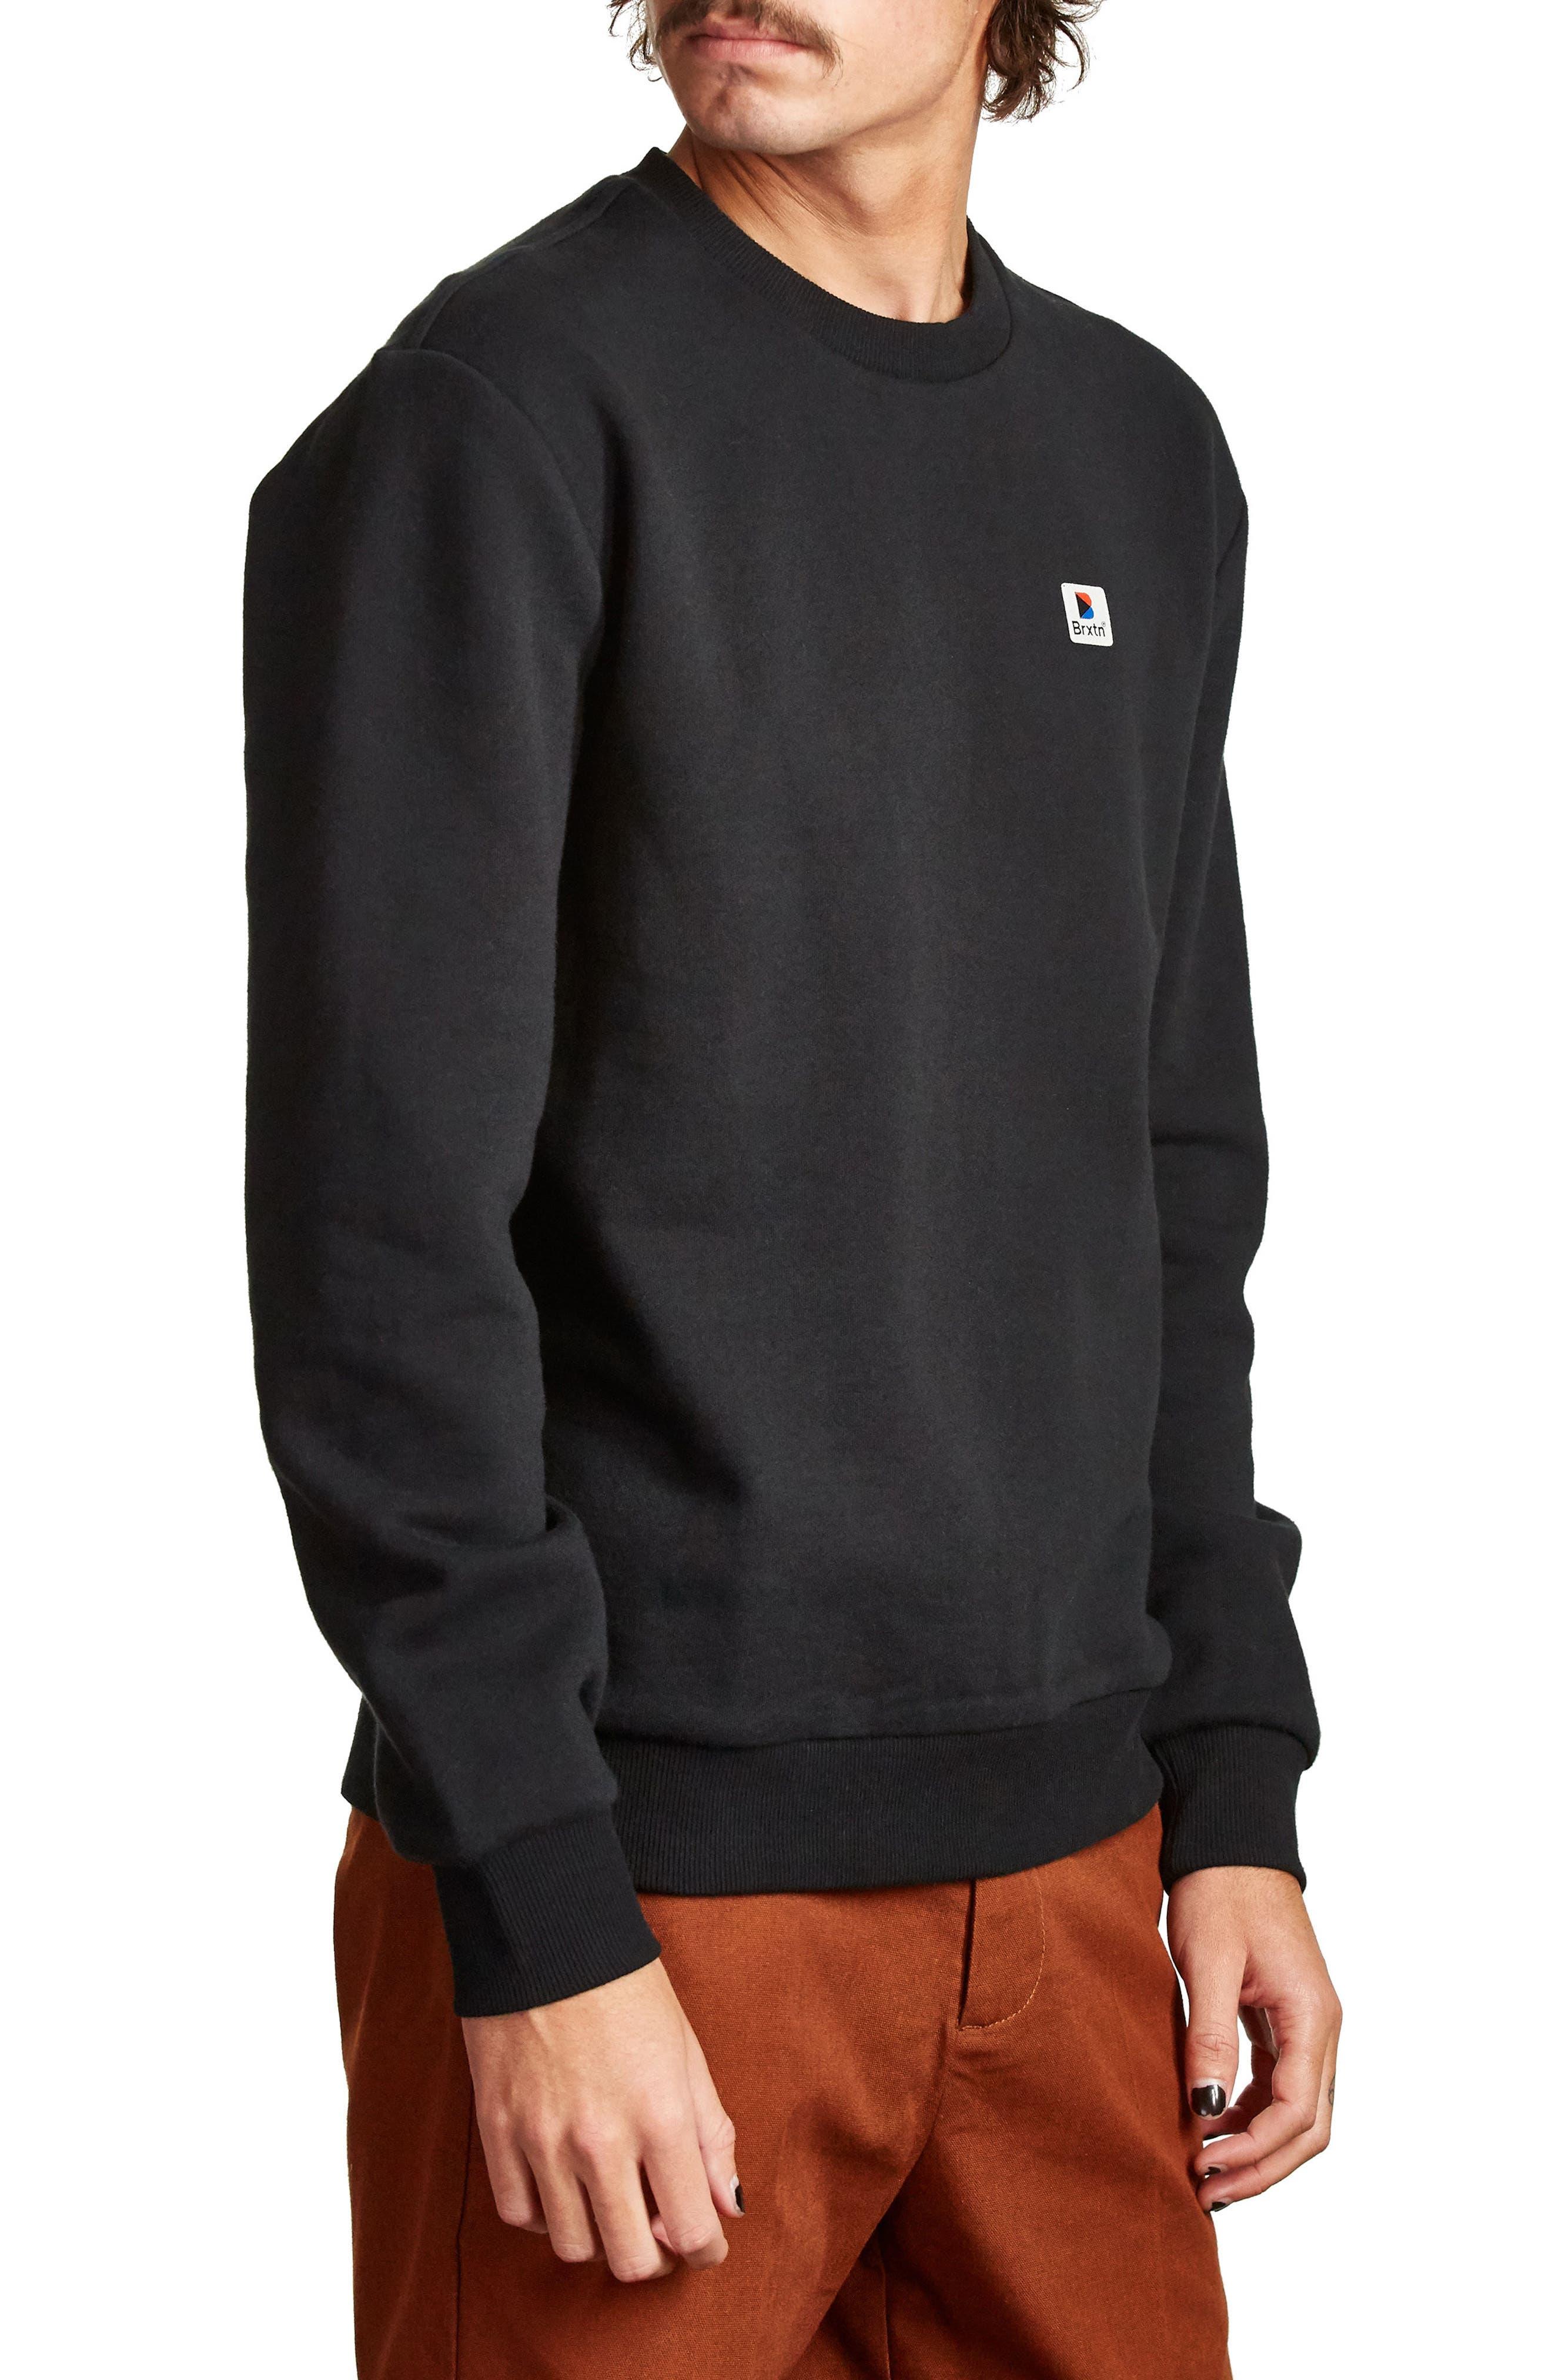 Stonewell Sweatshirt,                             Alternate thumbnail 3, color,                             001